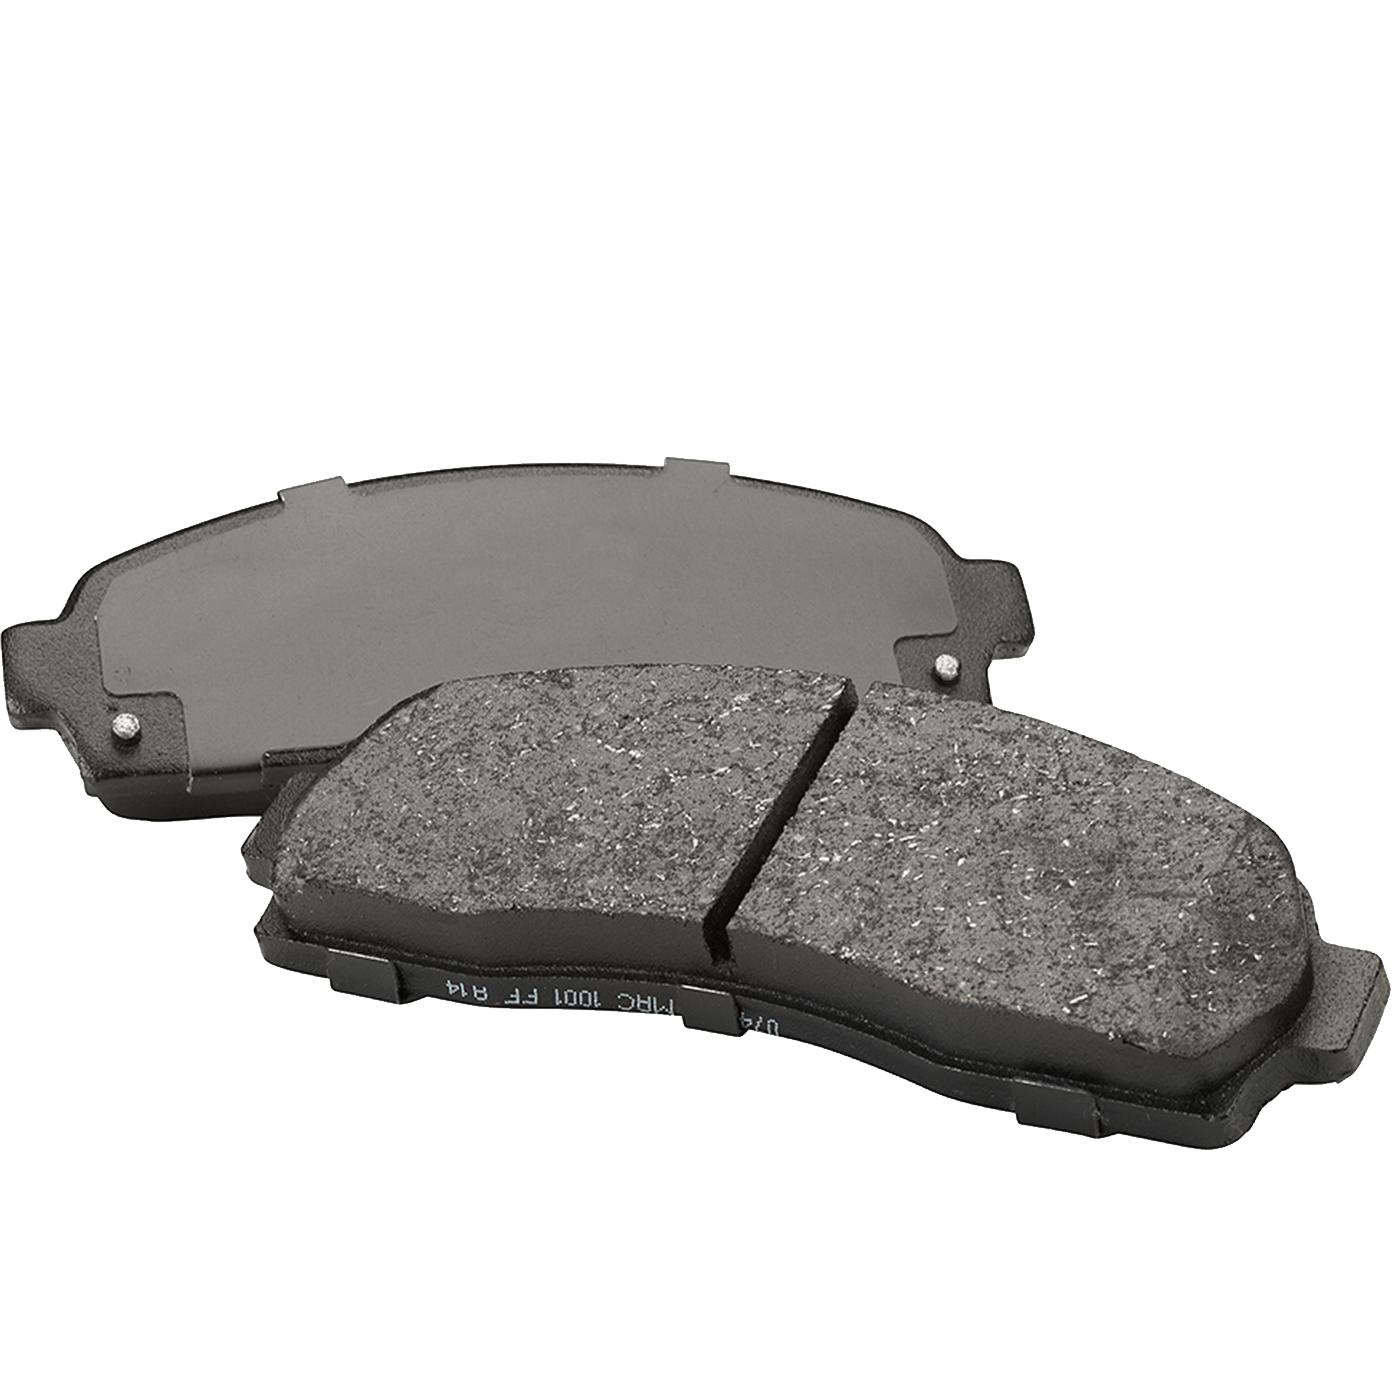 Brake pads organic ceramic and semi metallic what are